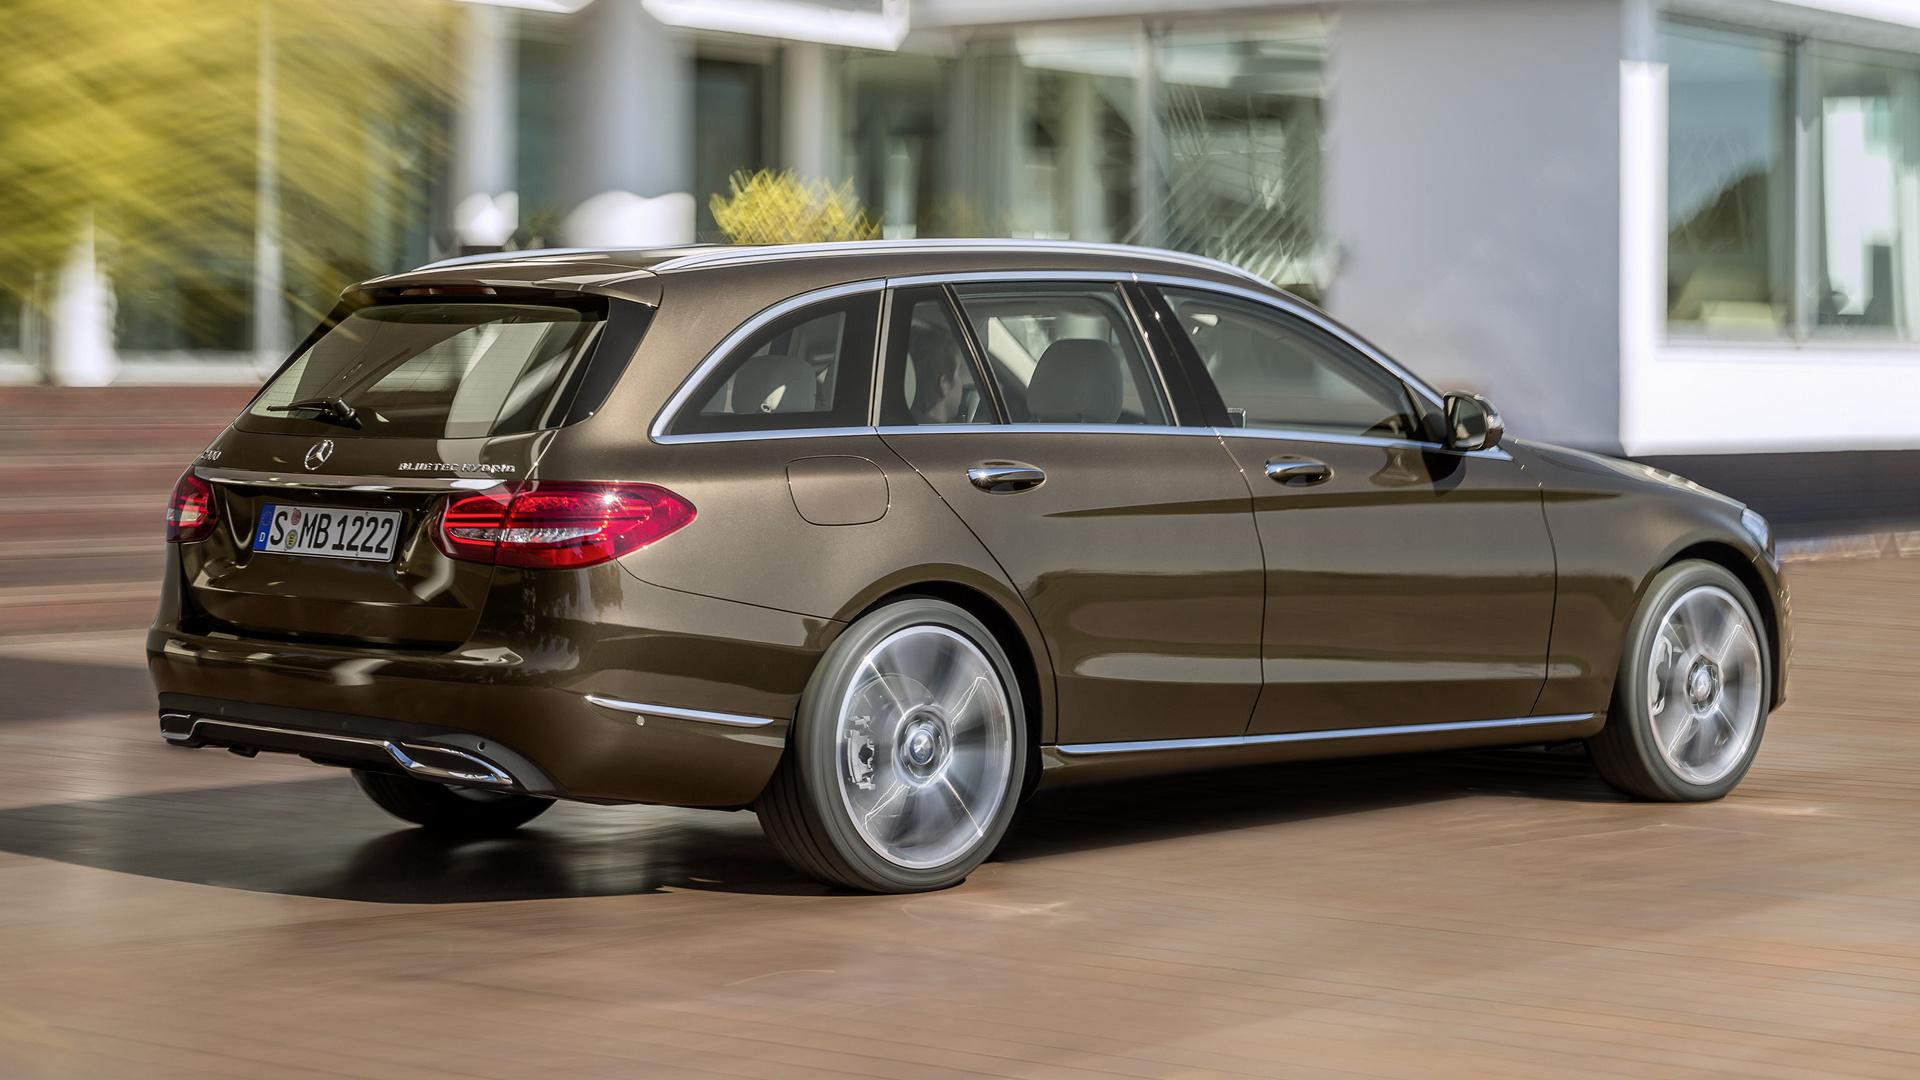 Mercedes benz c class estate hybrid with classic grille for Mercedes benz c class hybrid